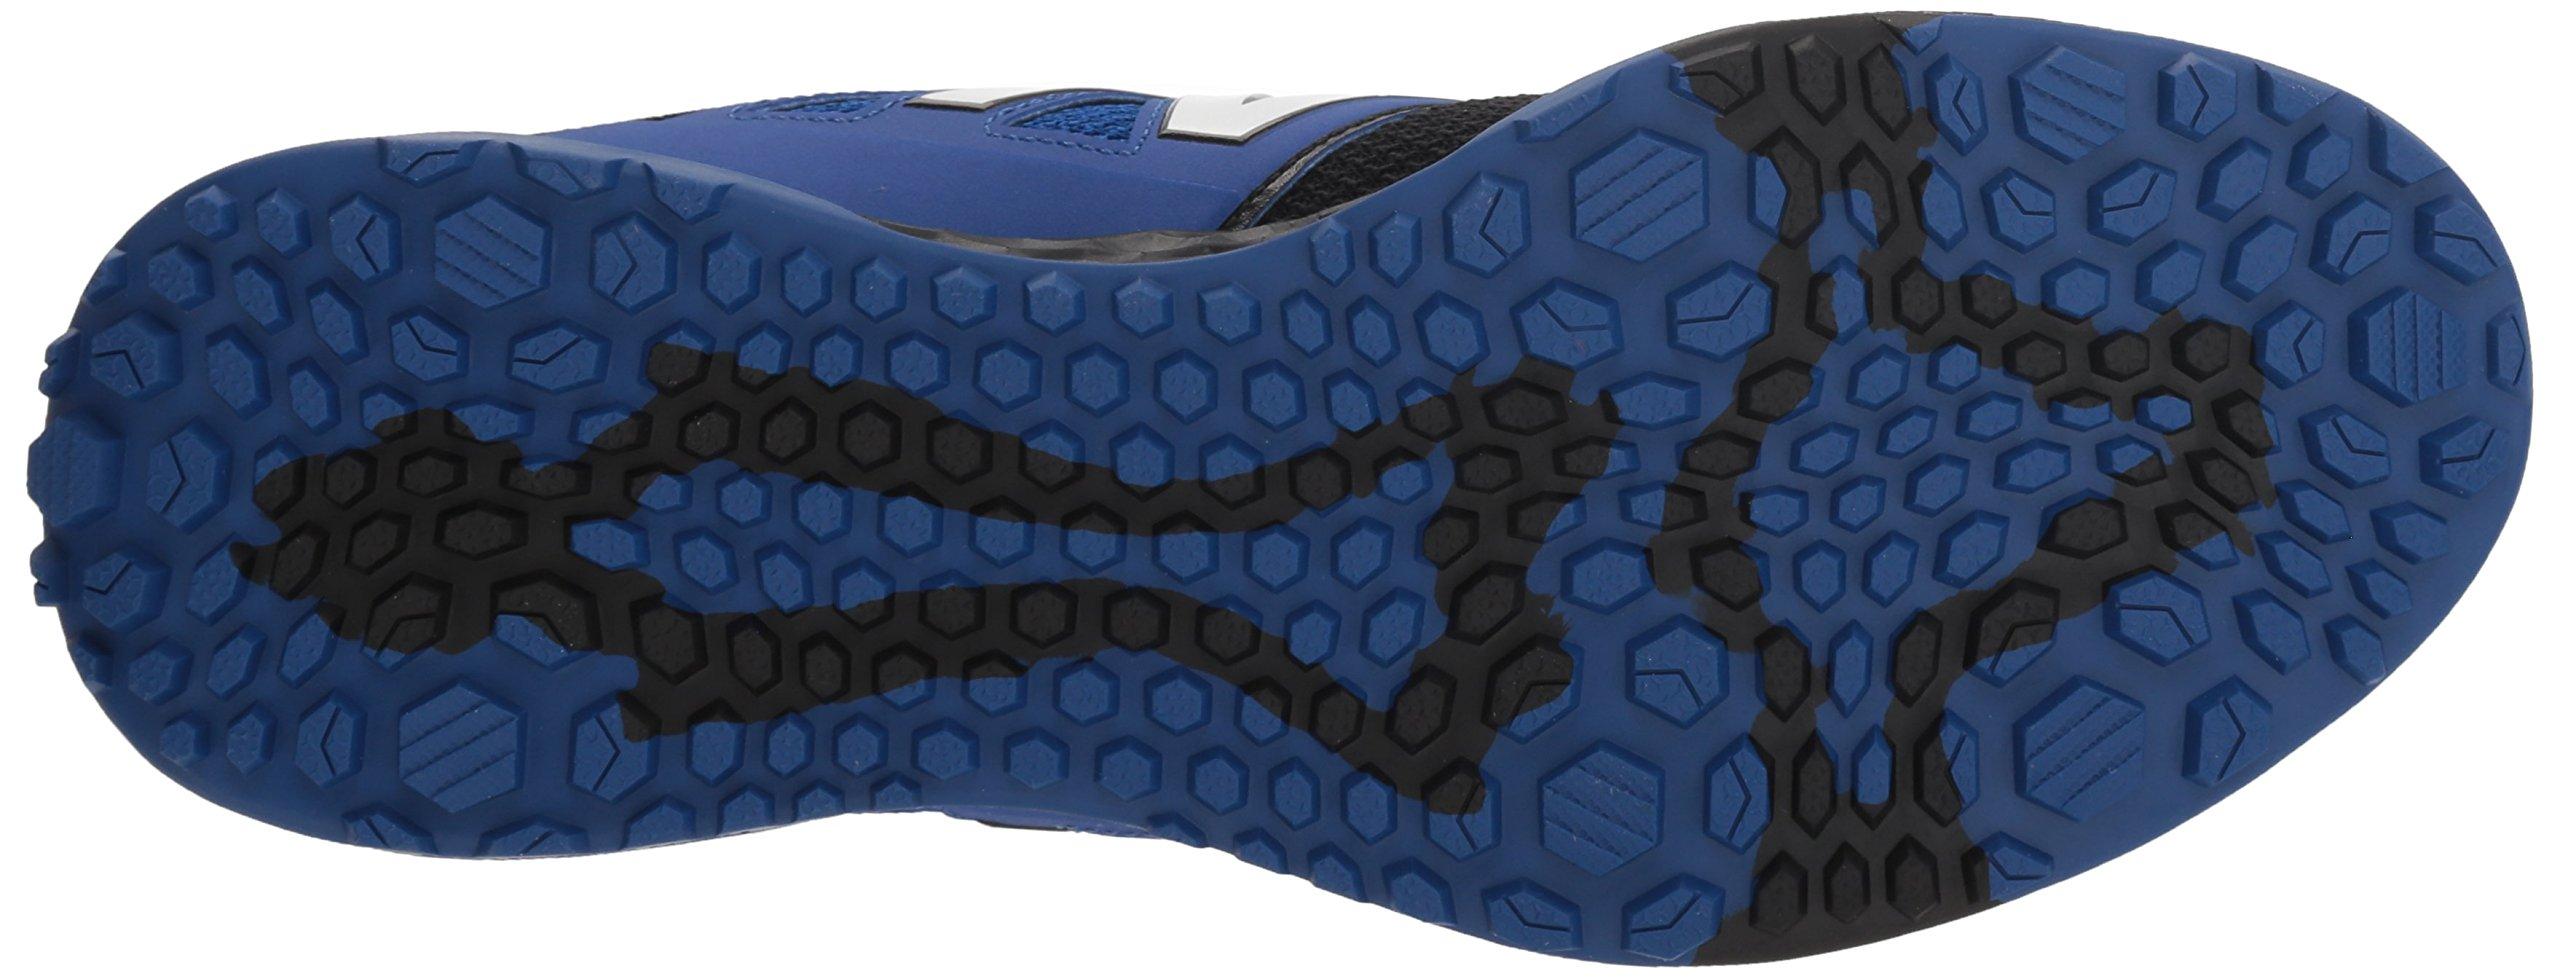 New Balance Men's 3000v4 Turf Baseball Shoe, Black/Blue, 5 D US by New Balance (Image #3)